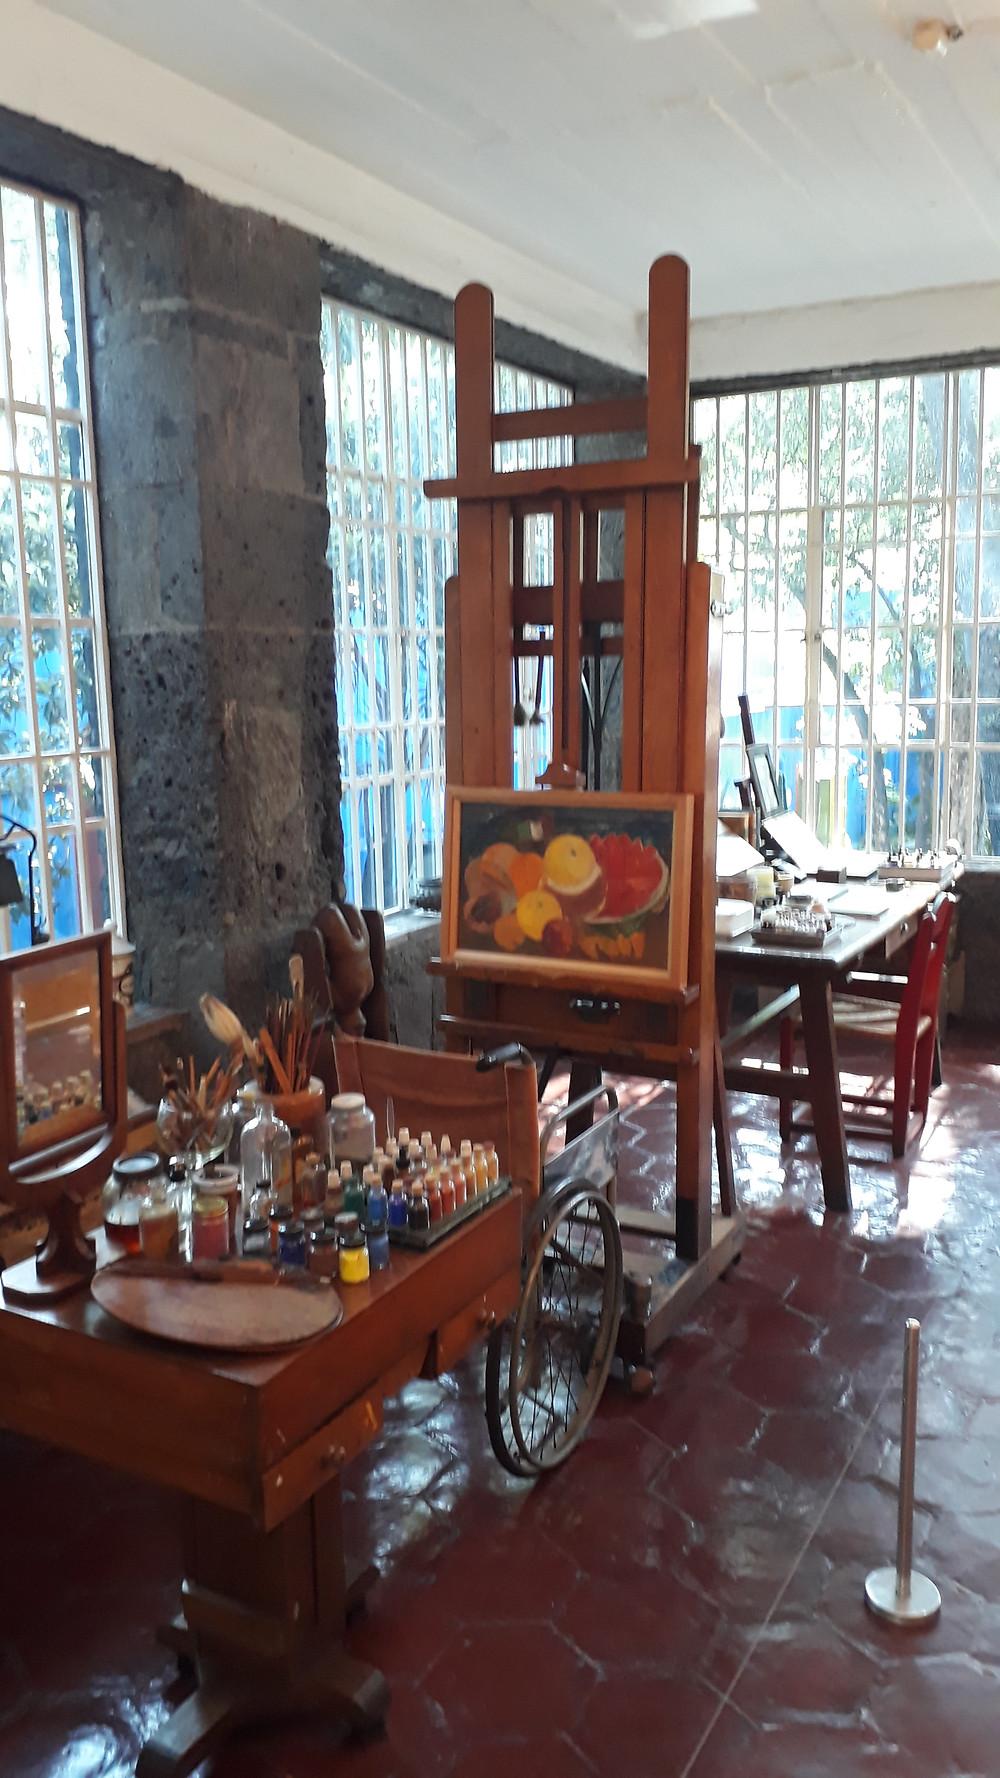 Estúdio de Frida